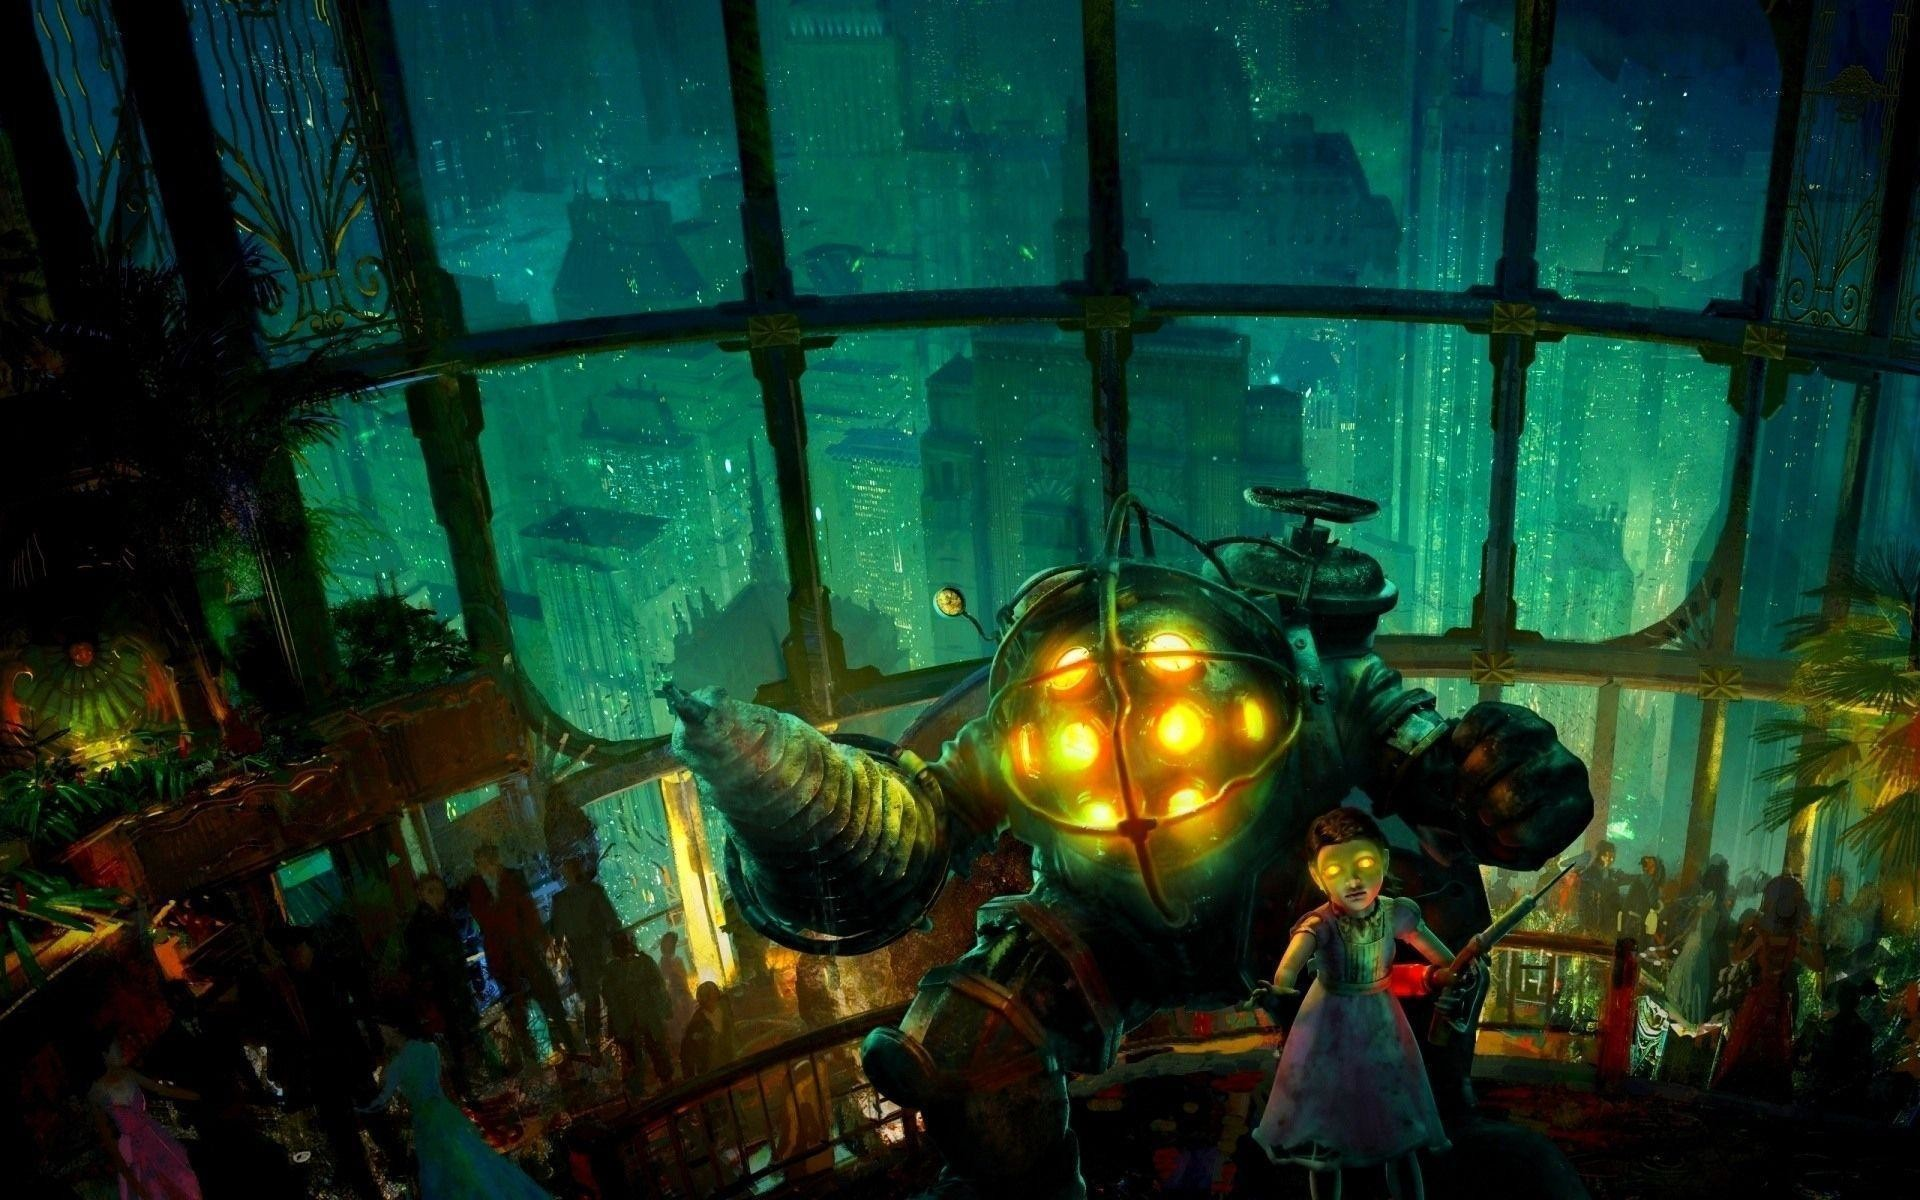 Desktop Wallpaper Bioshock Rapture Balls Masquerade Ball Hd Of ..